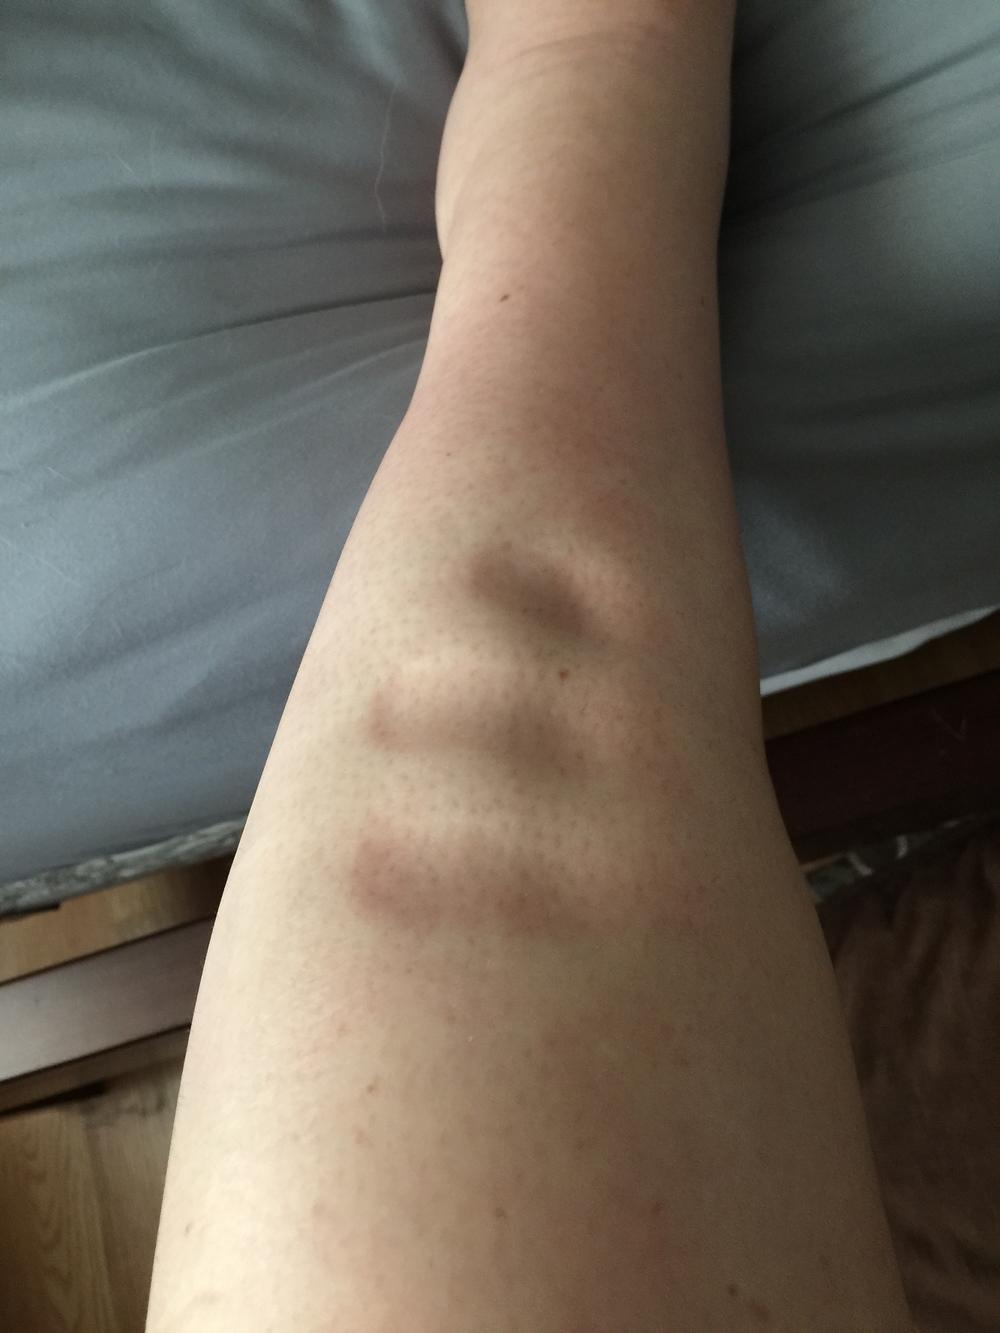 Shiny, squishy, impressionable edema skin!